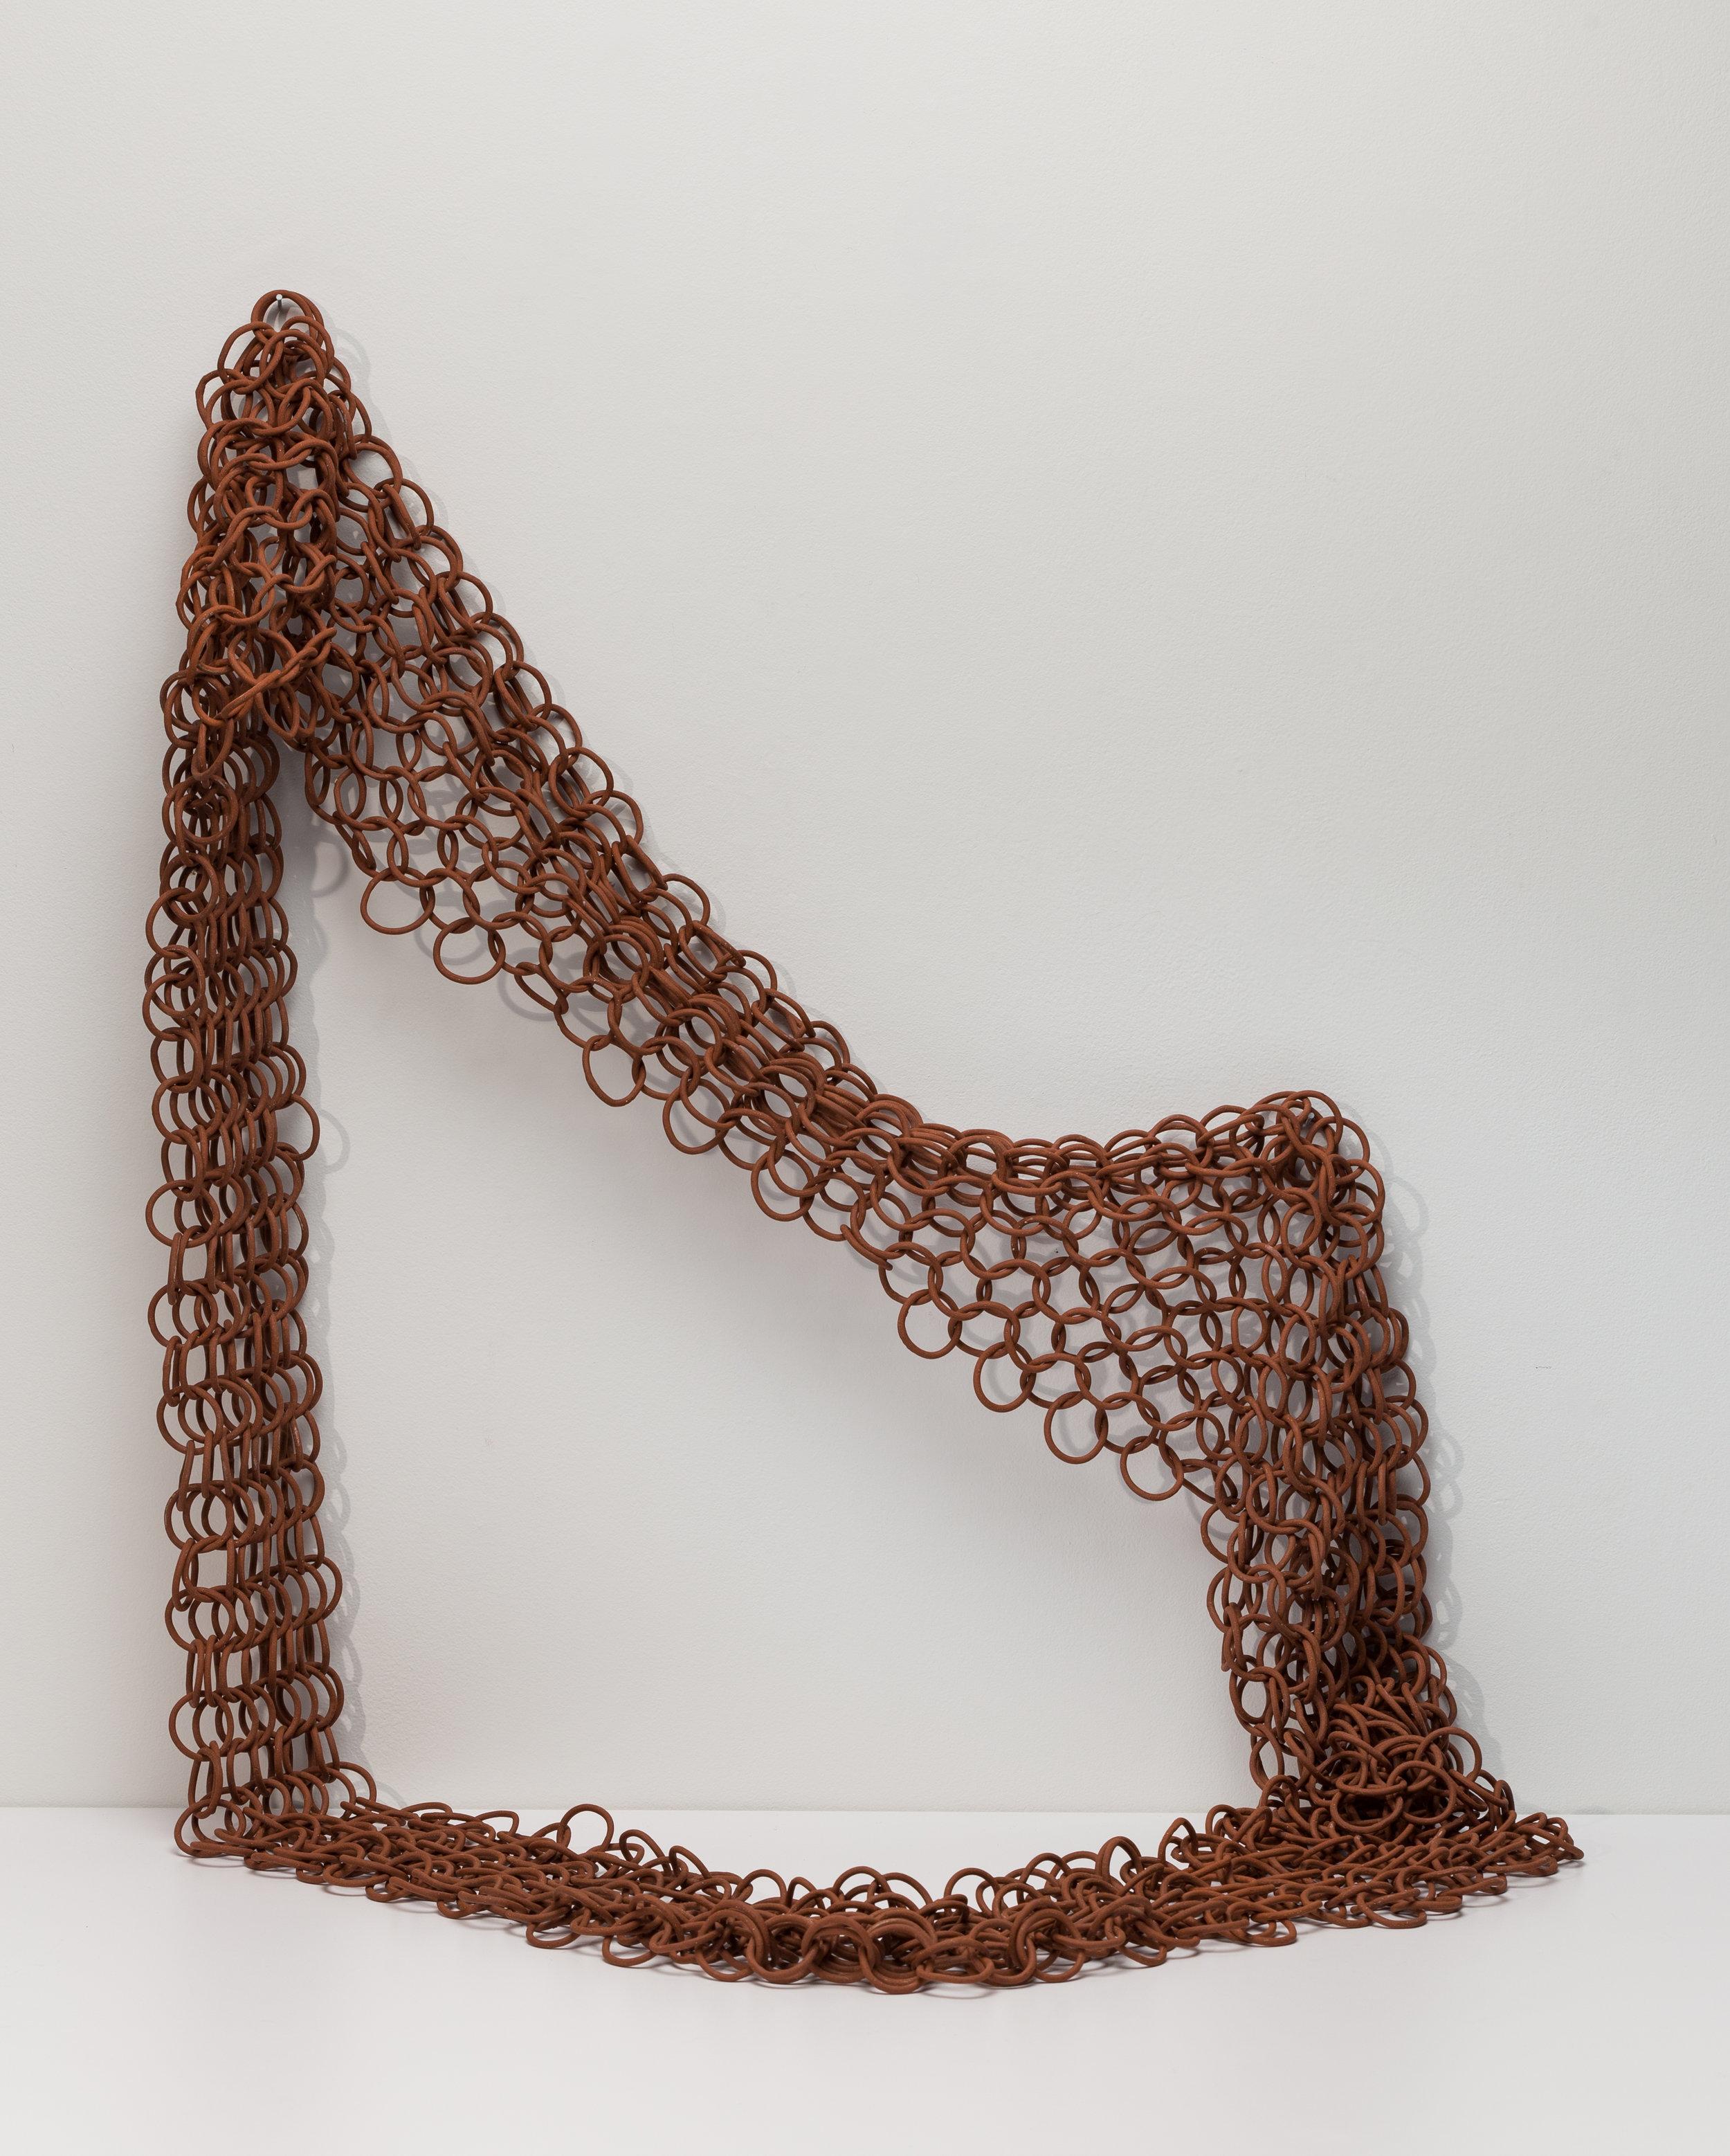 Chain Sculpture-Taylor Kibby